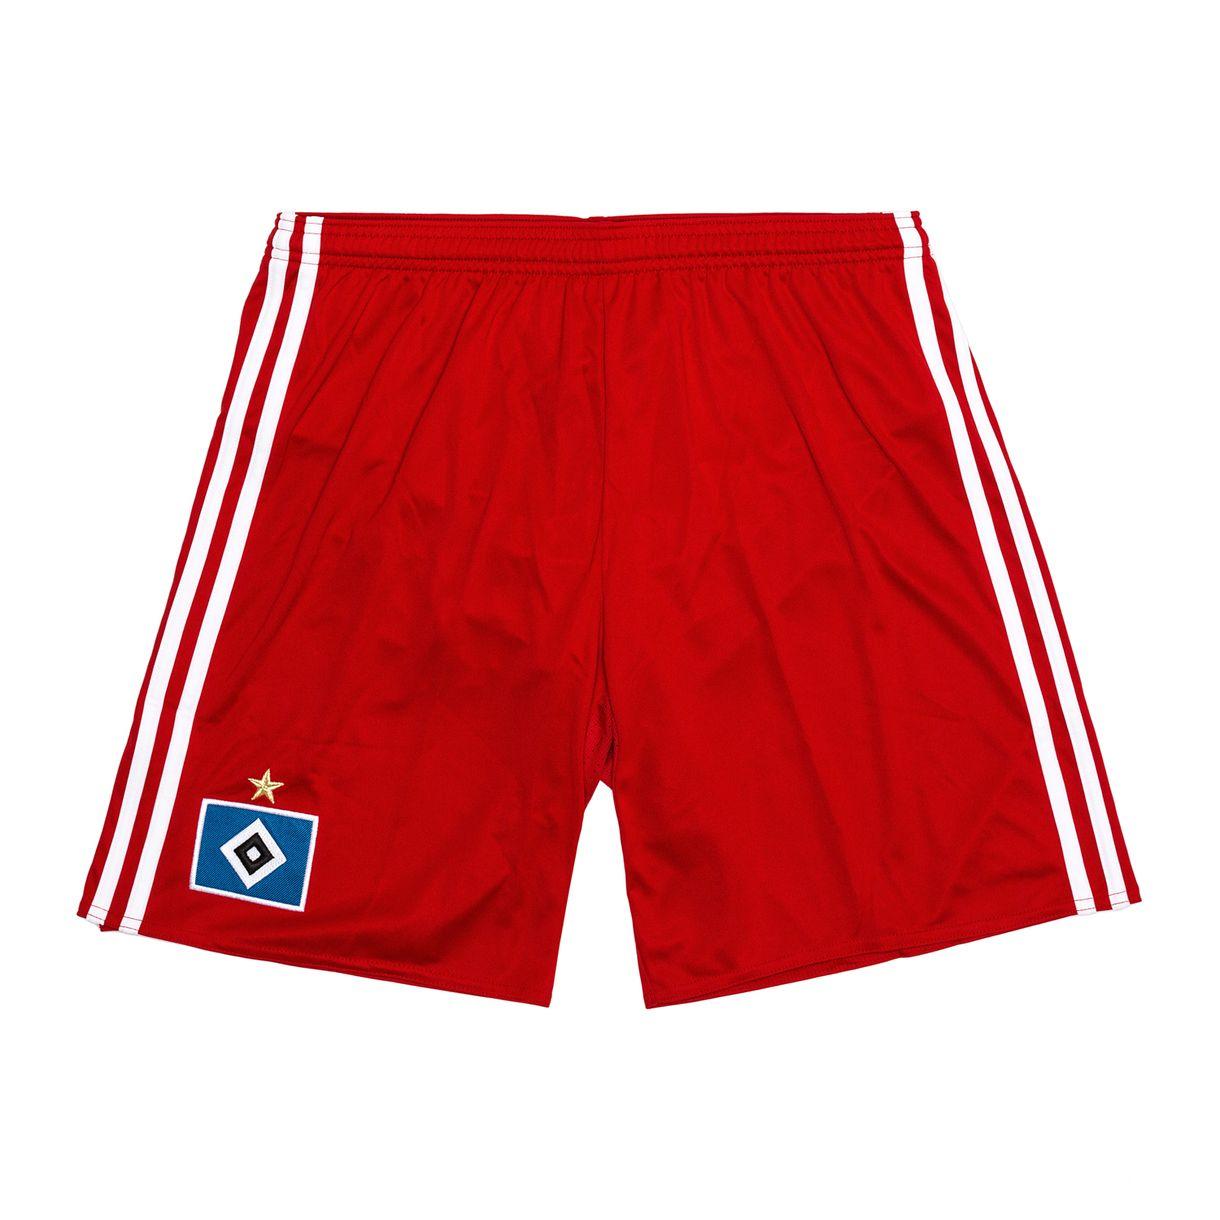 92ce12983c8887 Hamburg 2016-2017 Home Shorts (Red) - Kids  AH5290  -  23.57 Teamzo.com